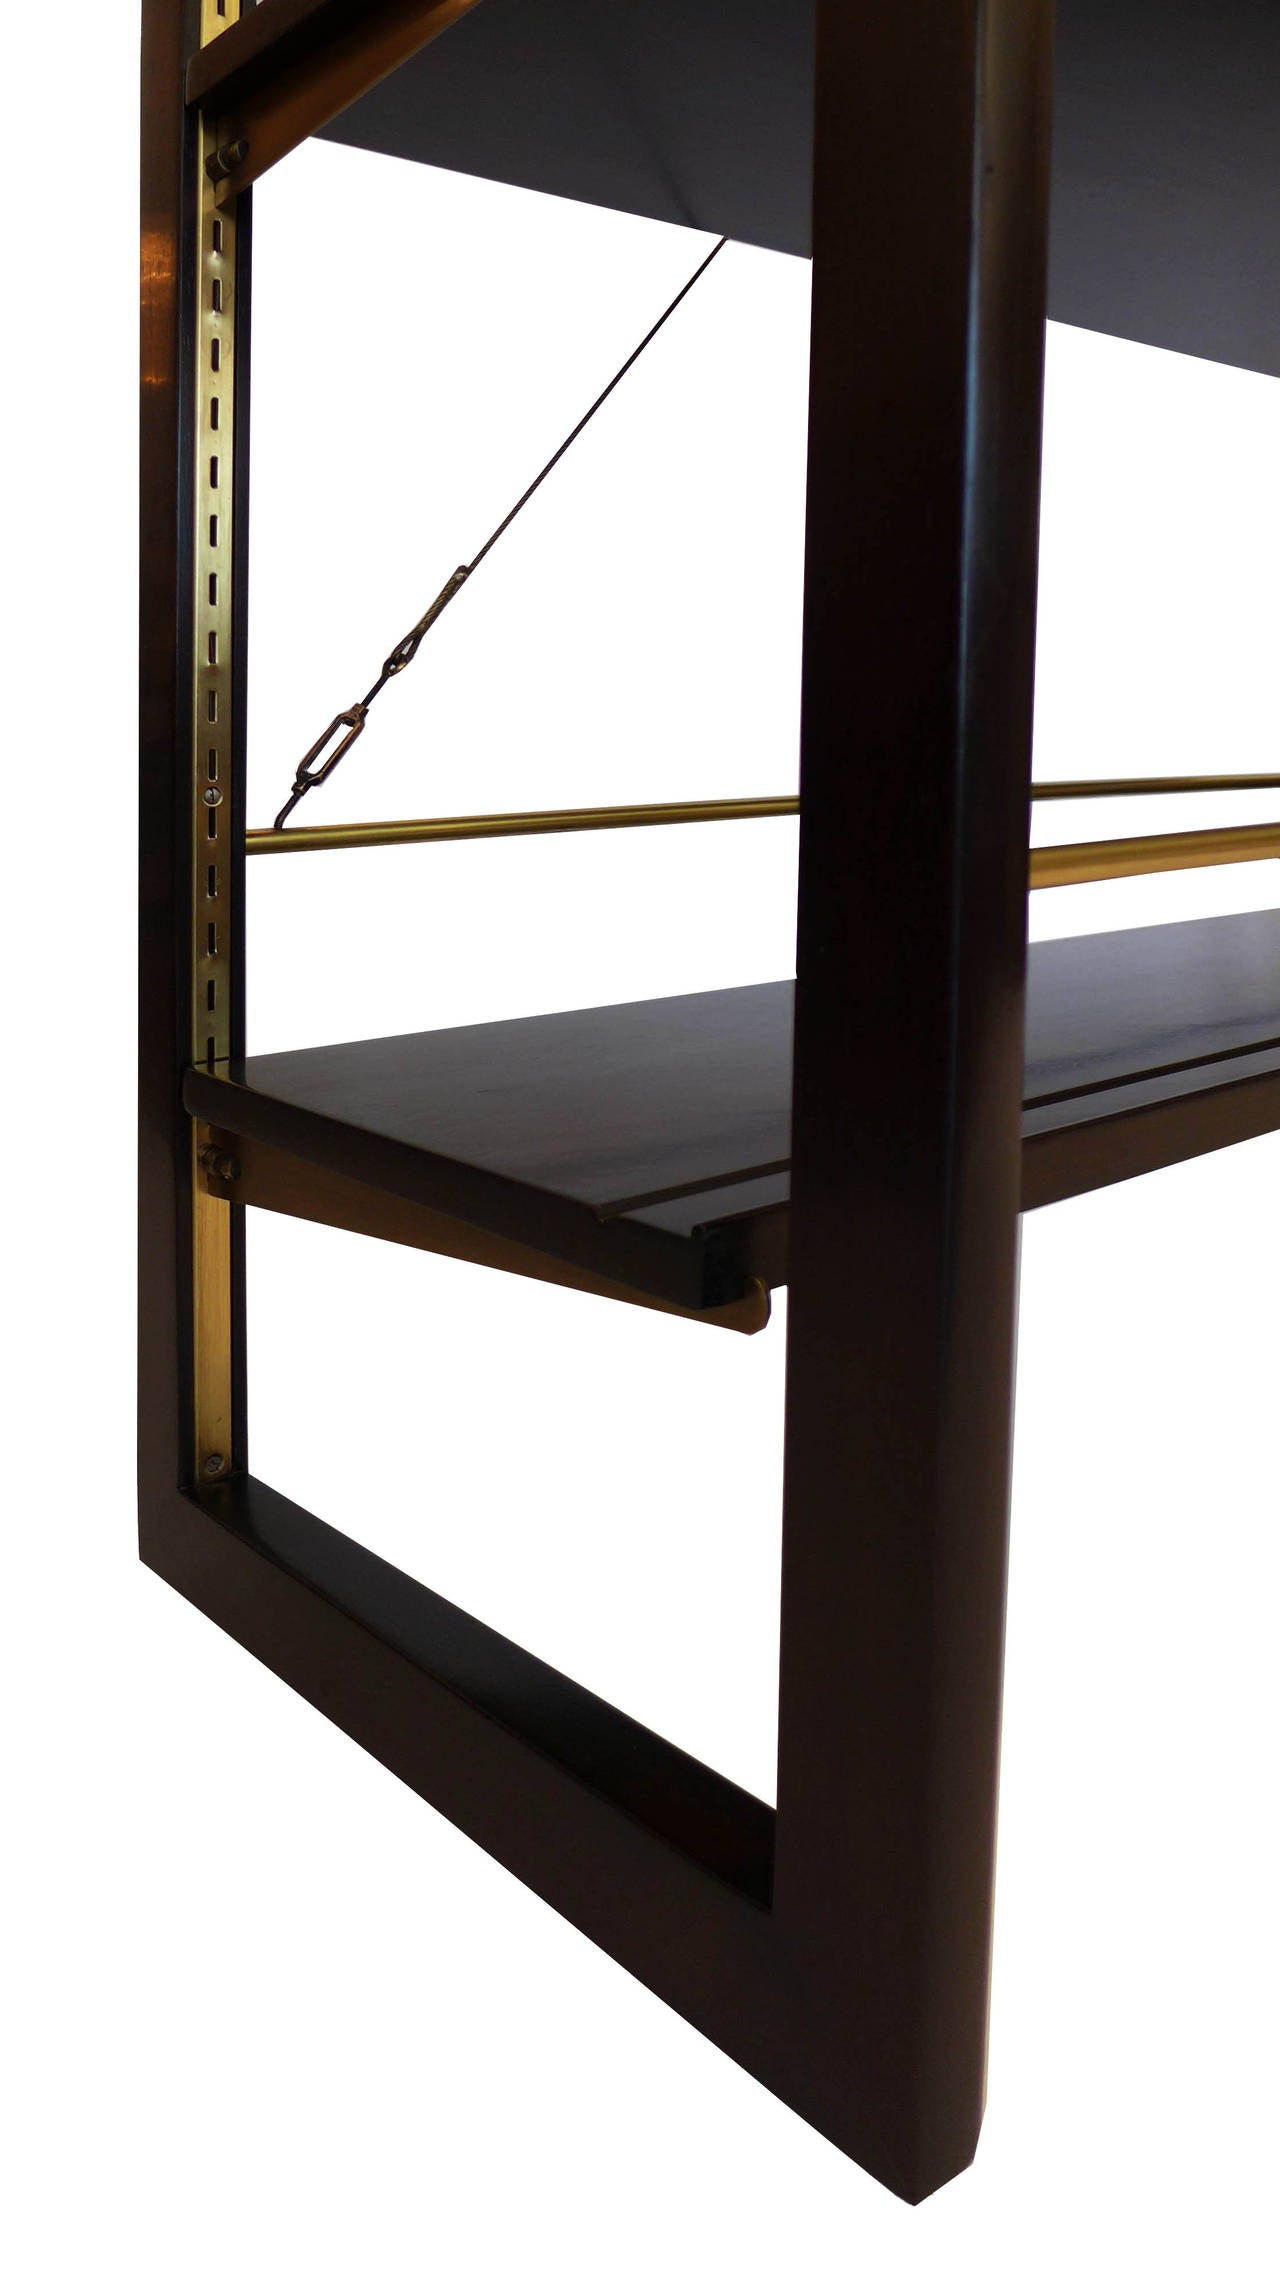 Rare Edward Wormley Open Frame Lit Shelf Room Divider for Dunbar 5